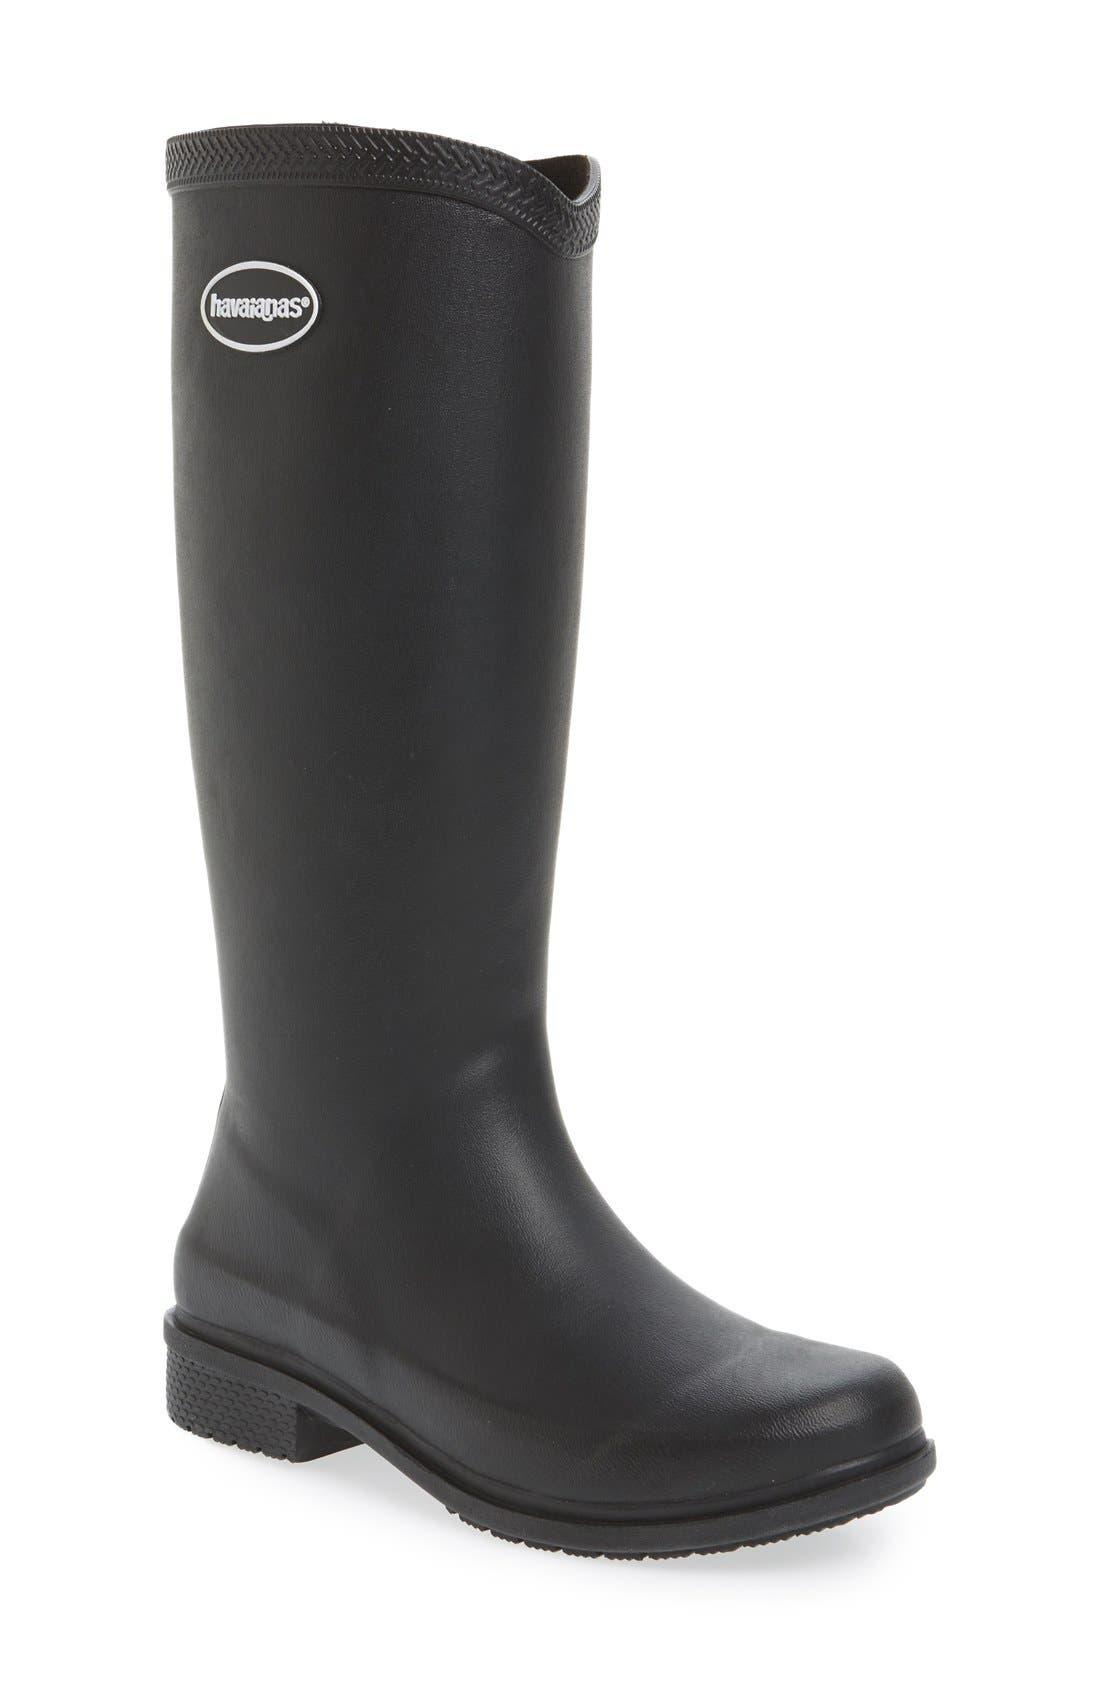 Alternate Image 1 Selected - Havaianas 'Galochas Hi Matte' Waterproof Rain Boot (Women) (Wide Calf)